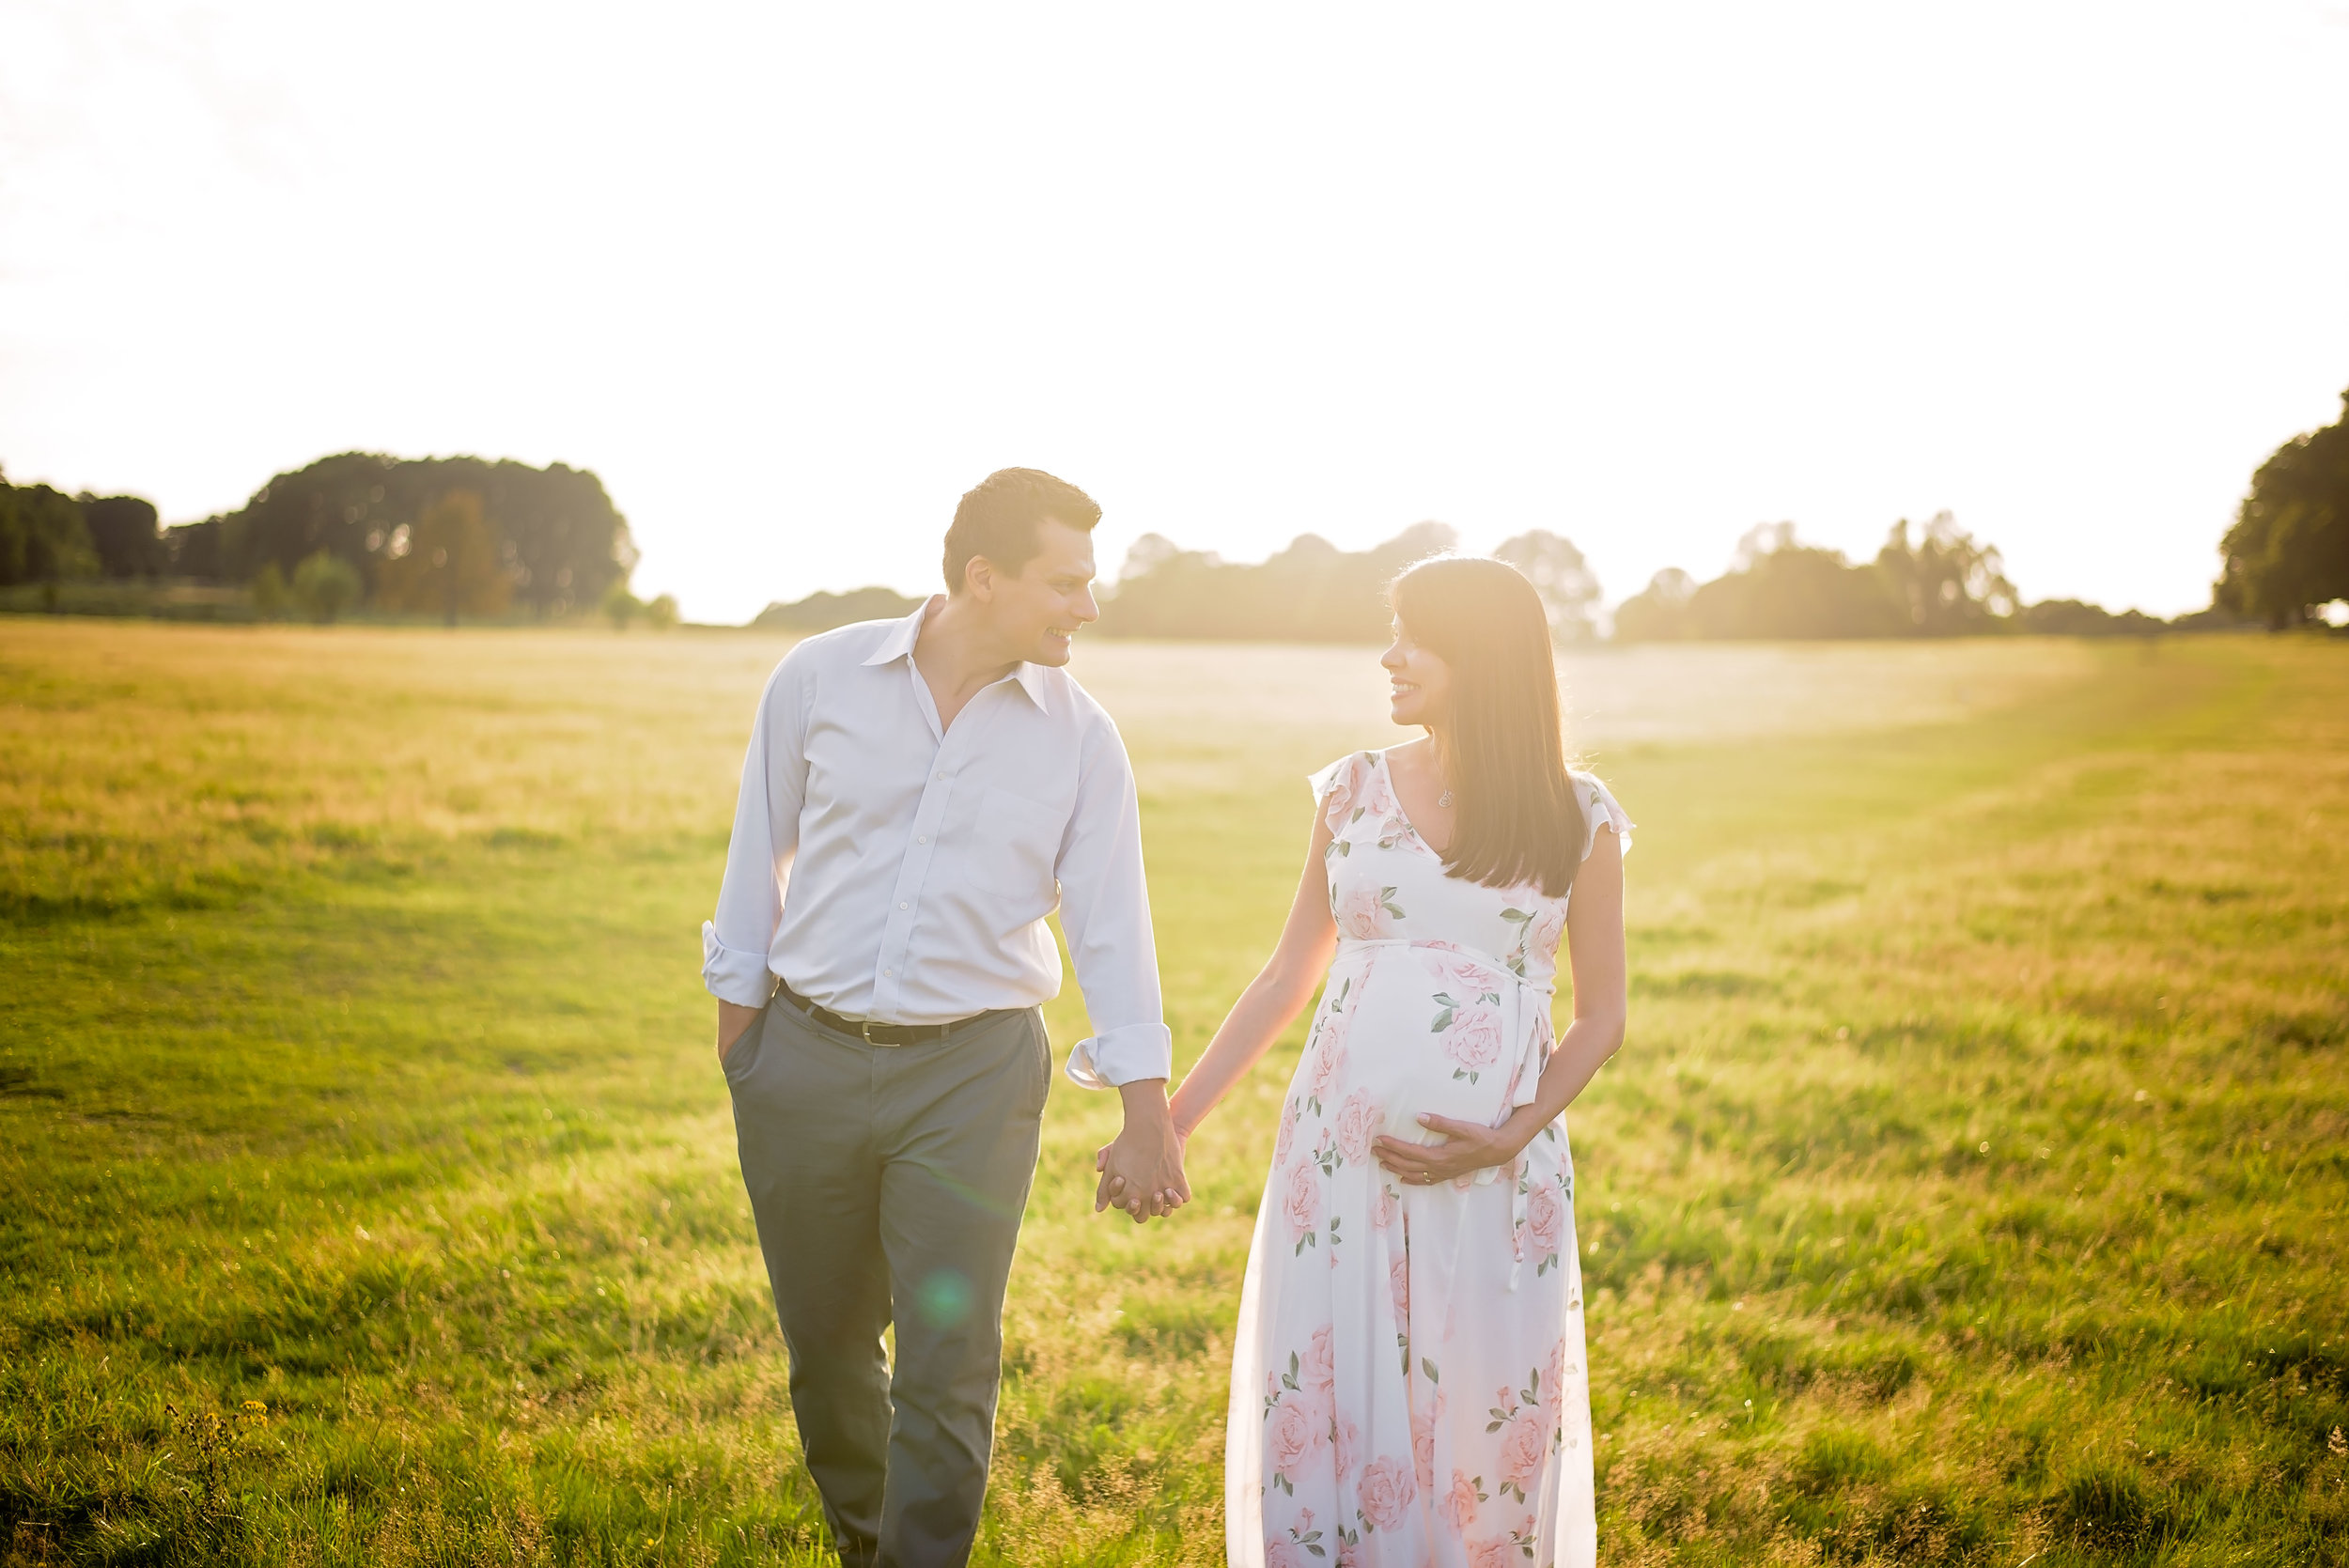 Maternity photoshoot with partner